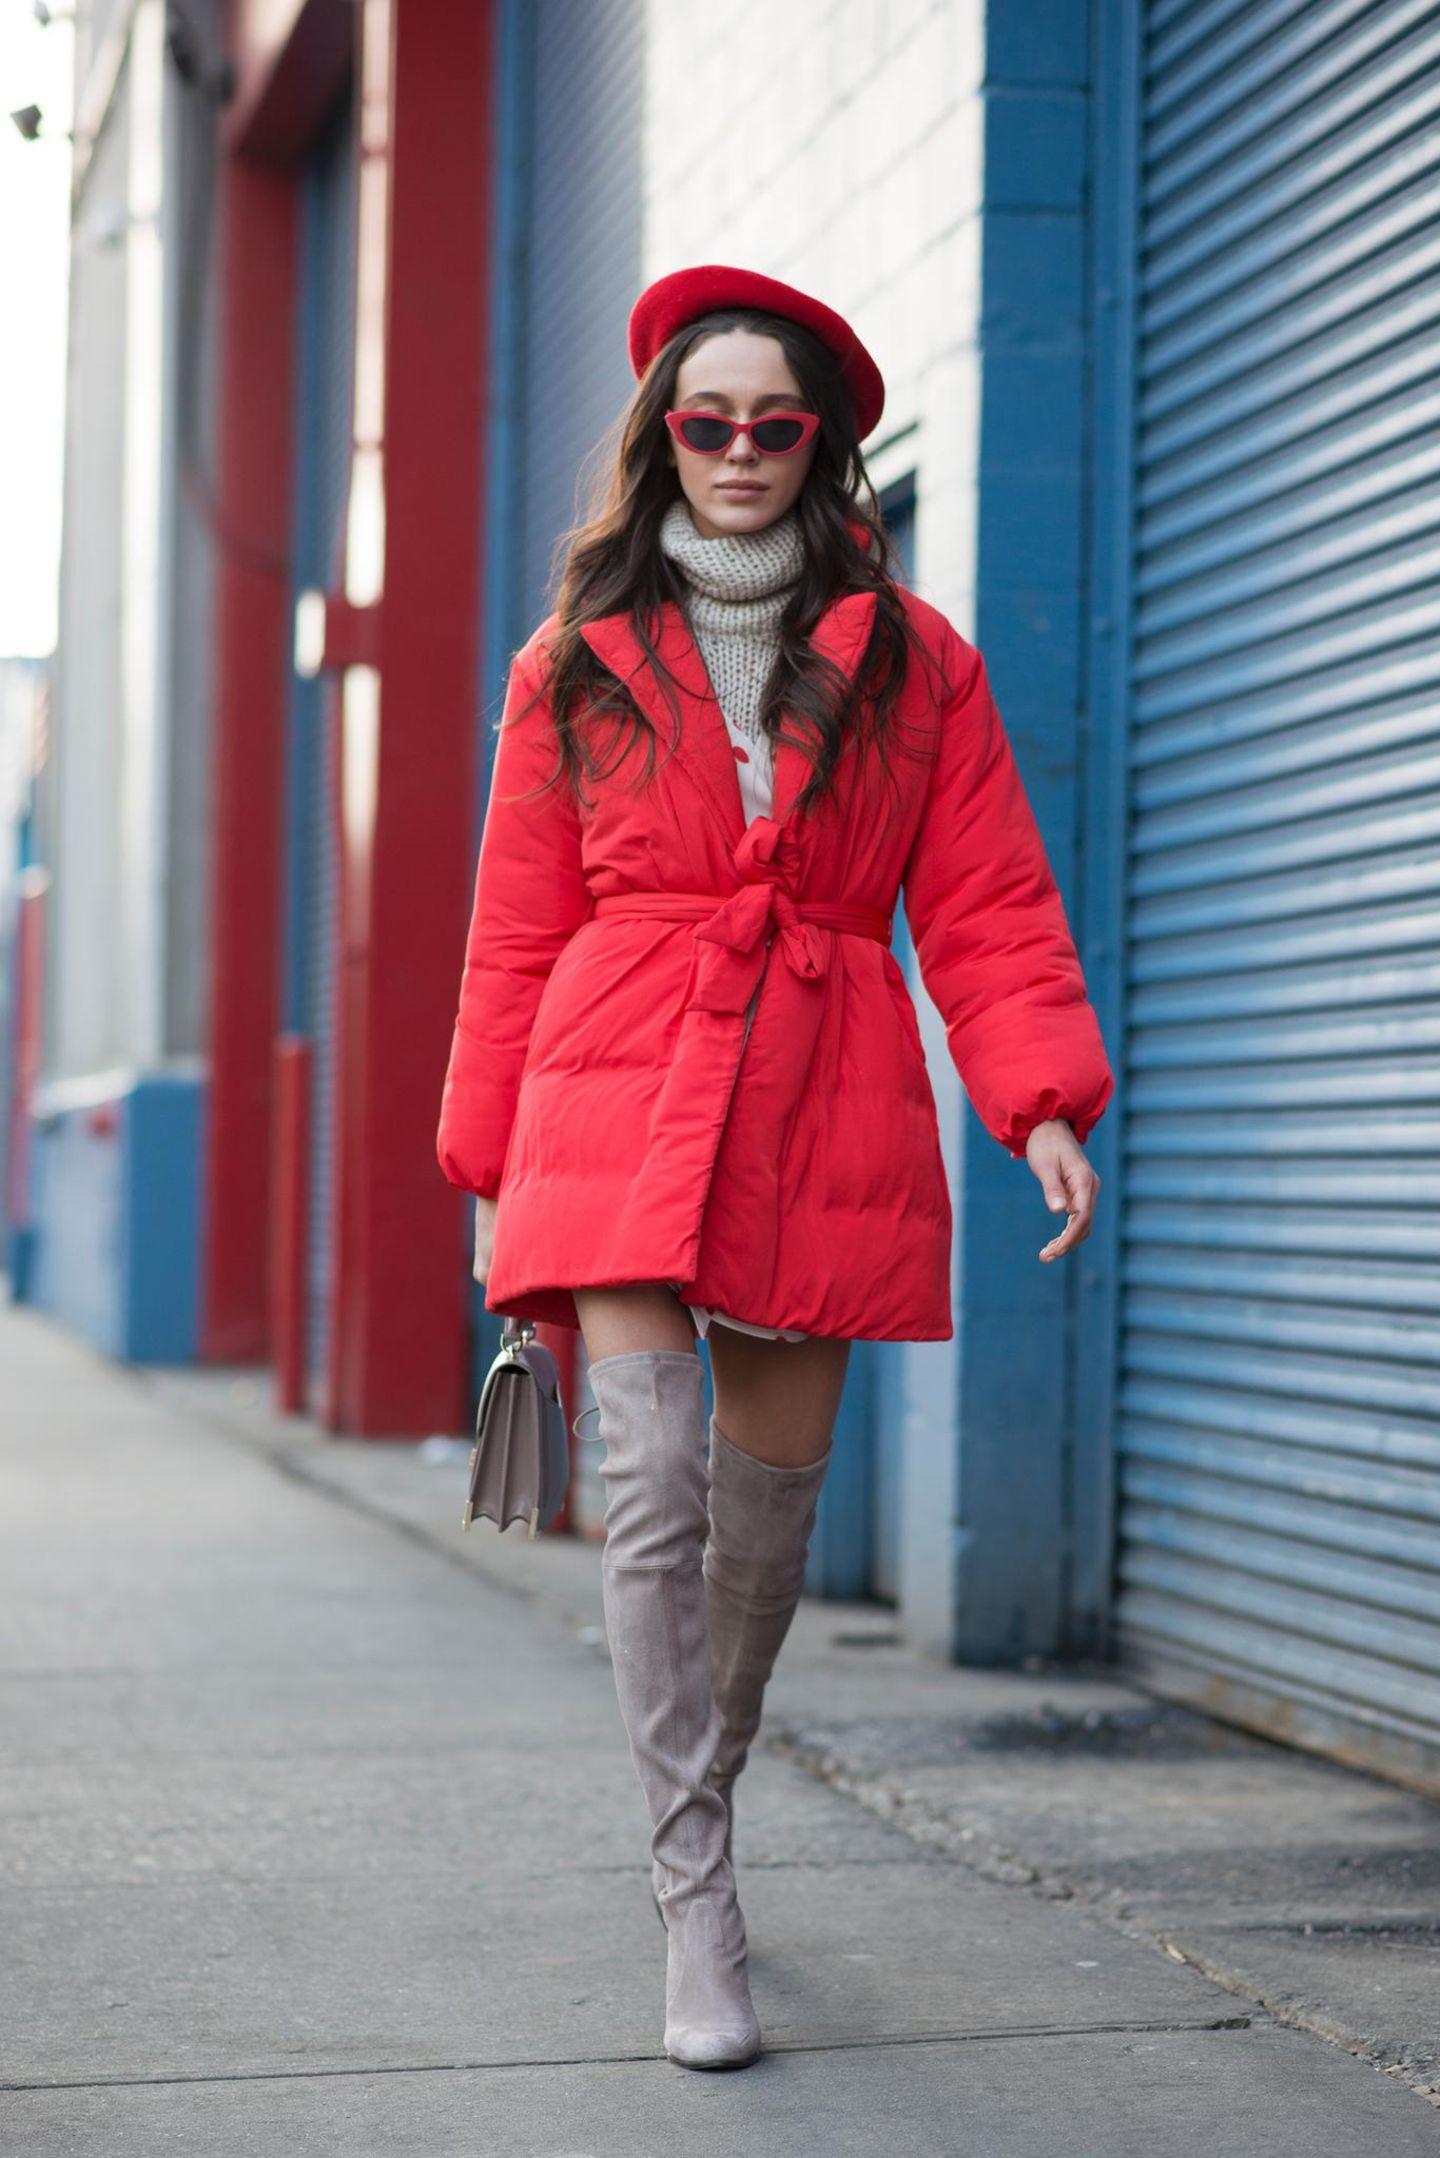 Daunenjacke in Rot an einer Frau